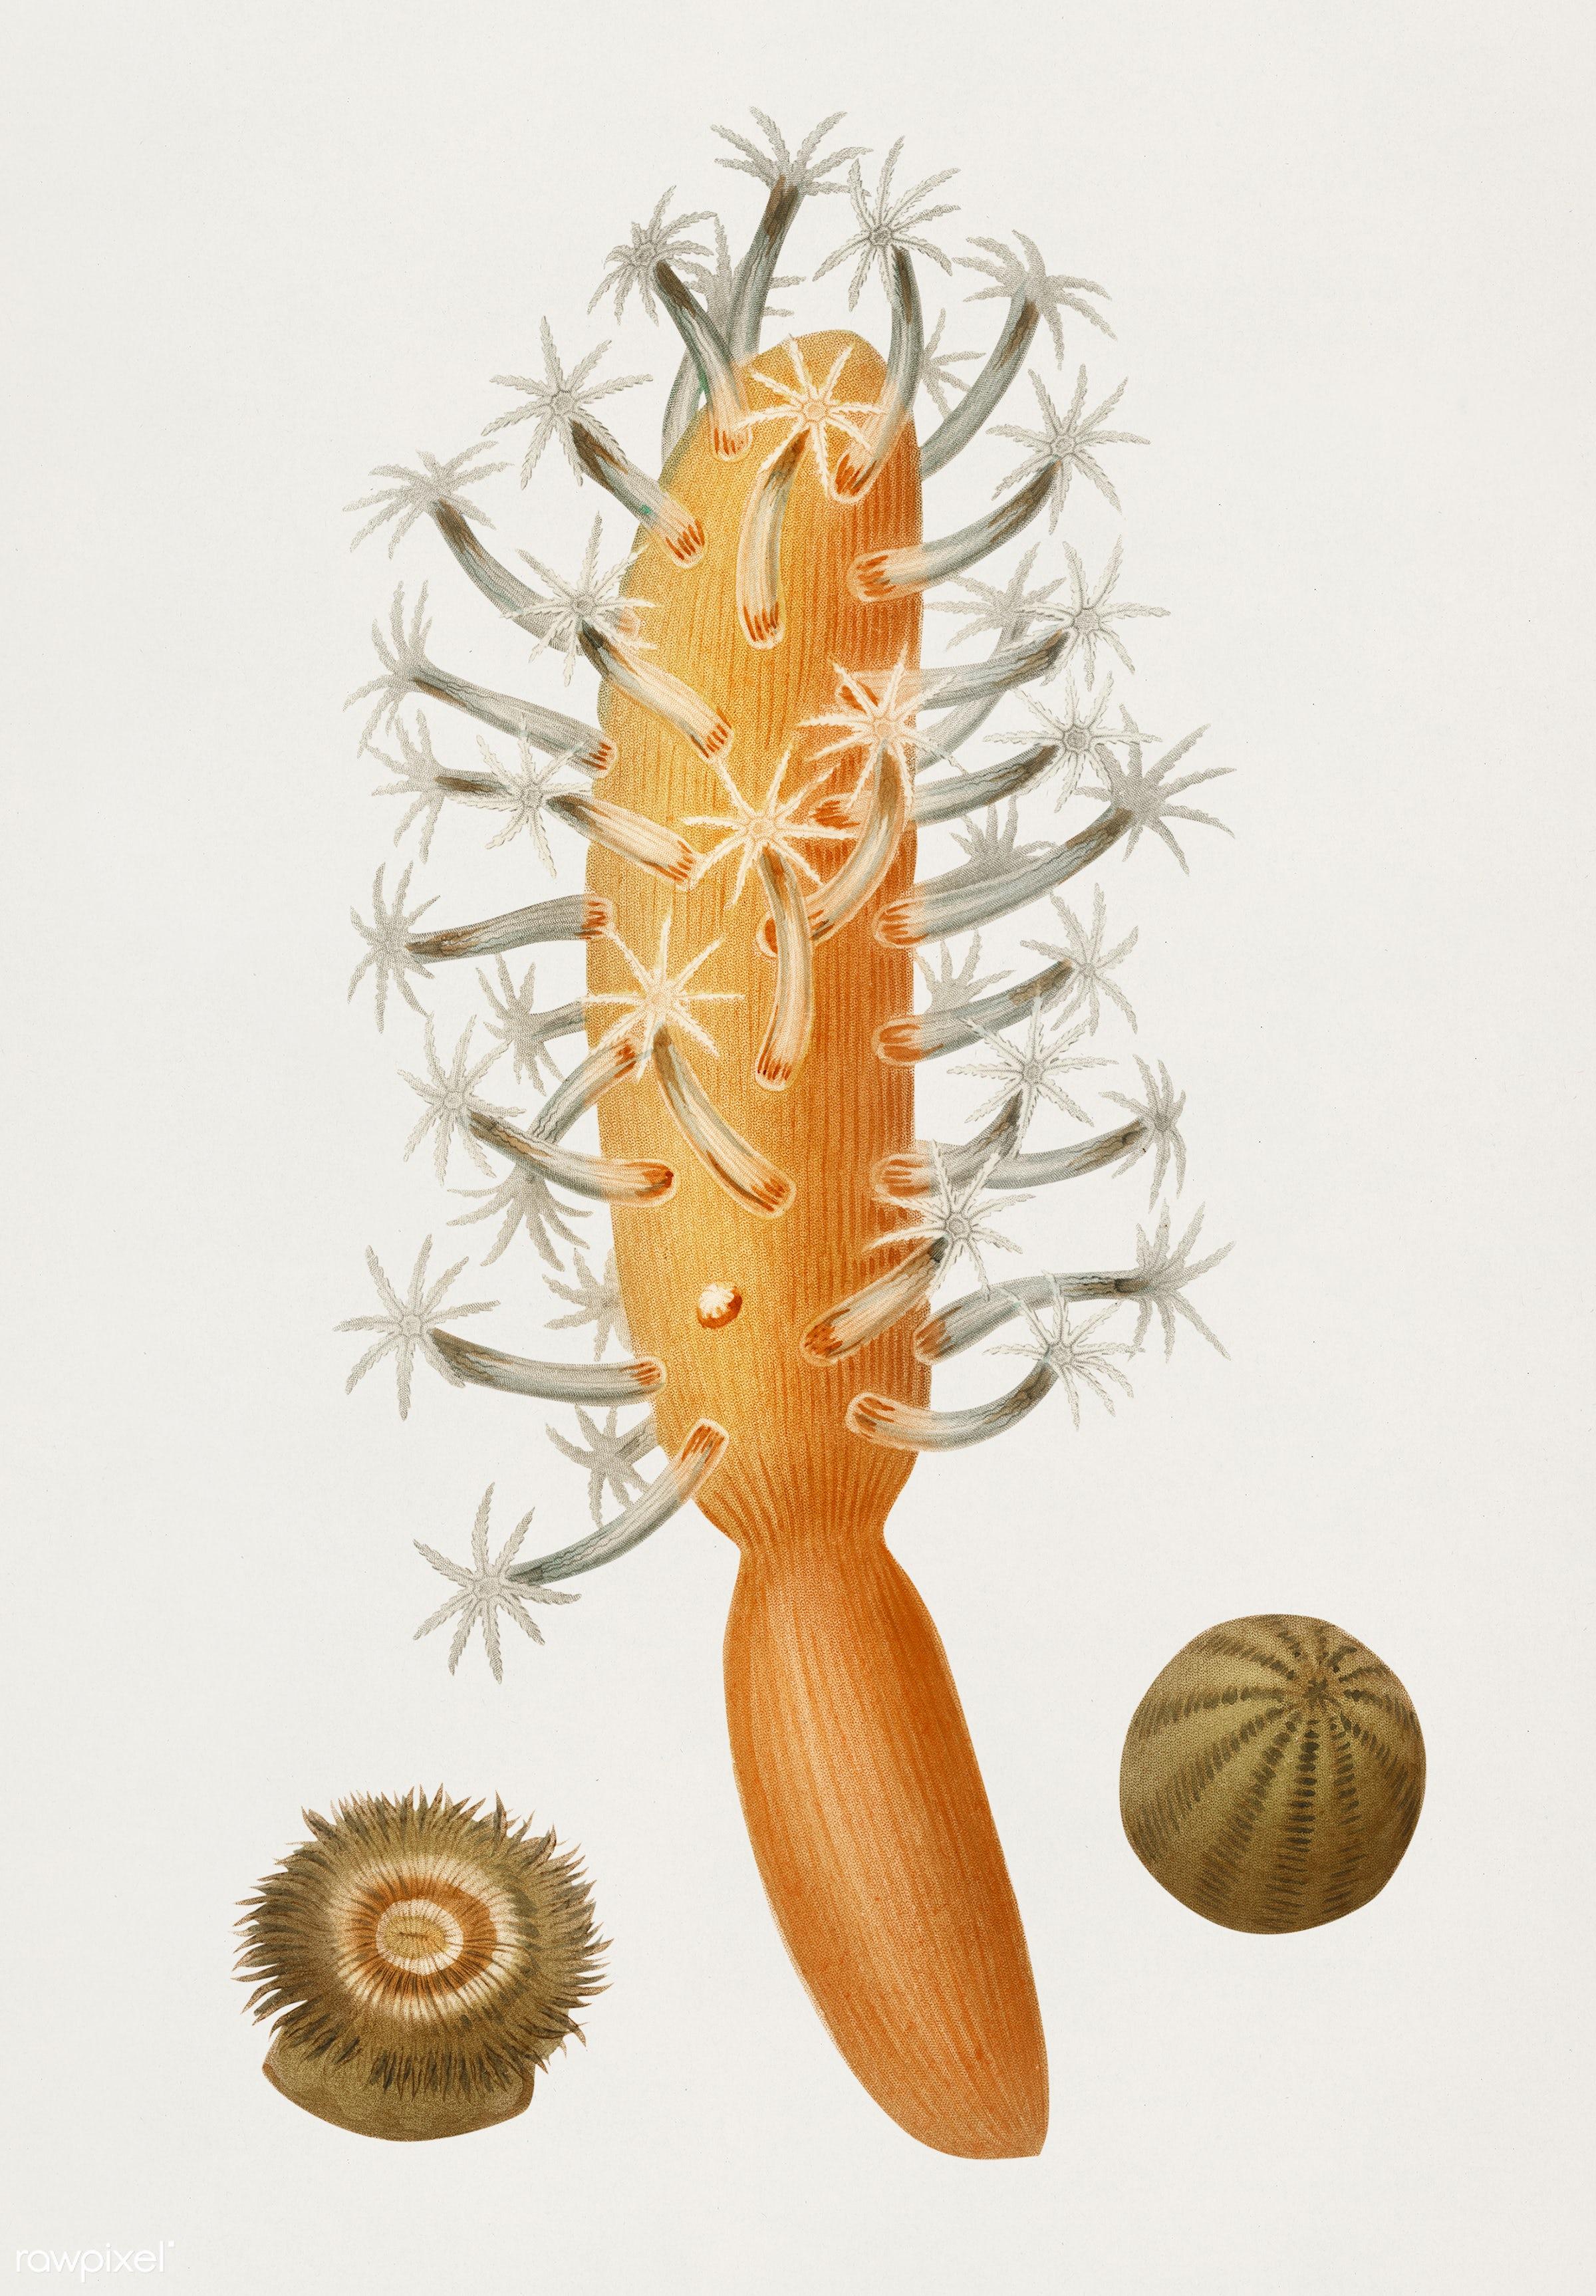 Veretillum cynomorium, sea carrot, Actinia effoeta, sea anemone illustrated by Charles Dessalines D' Orbigny (1806-1876...